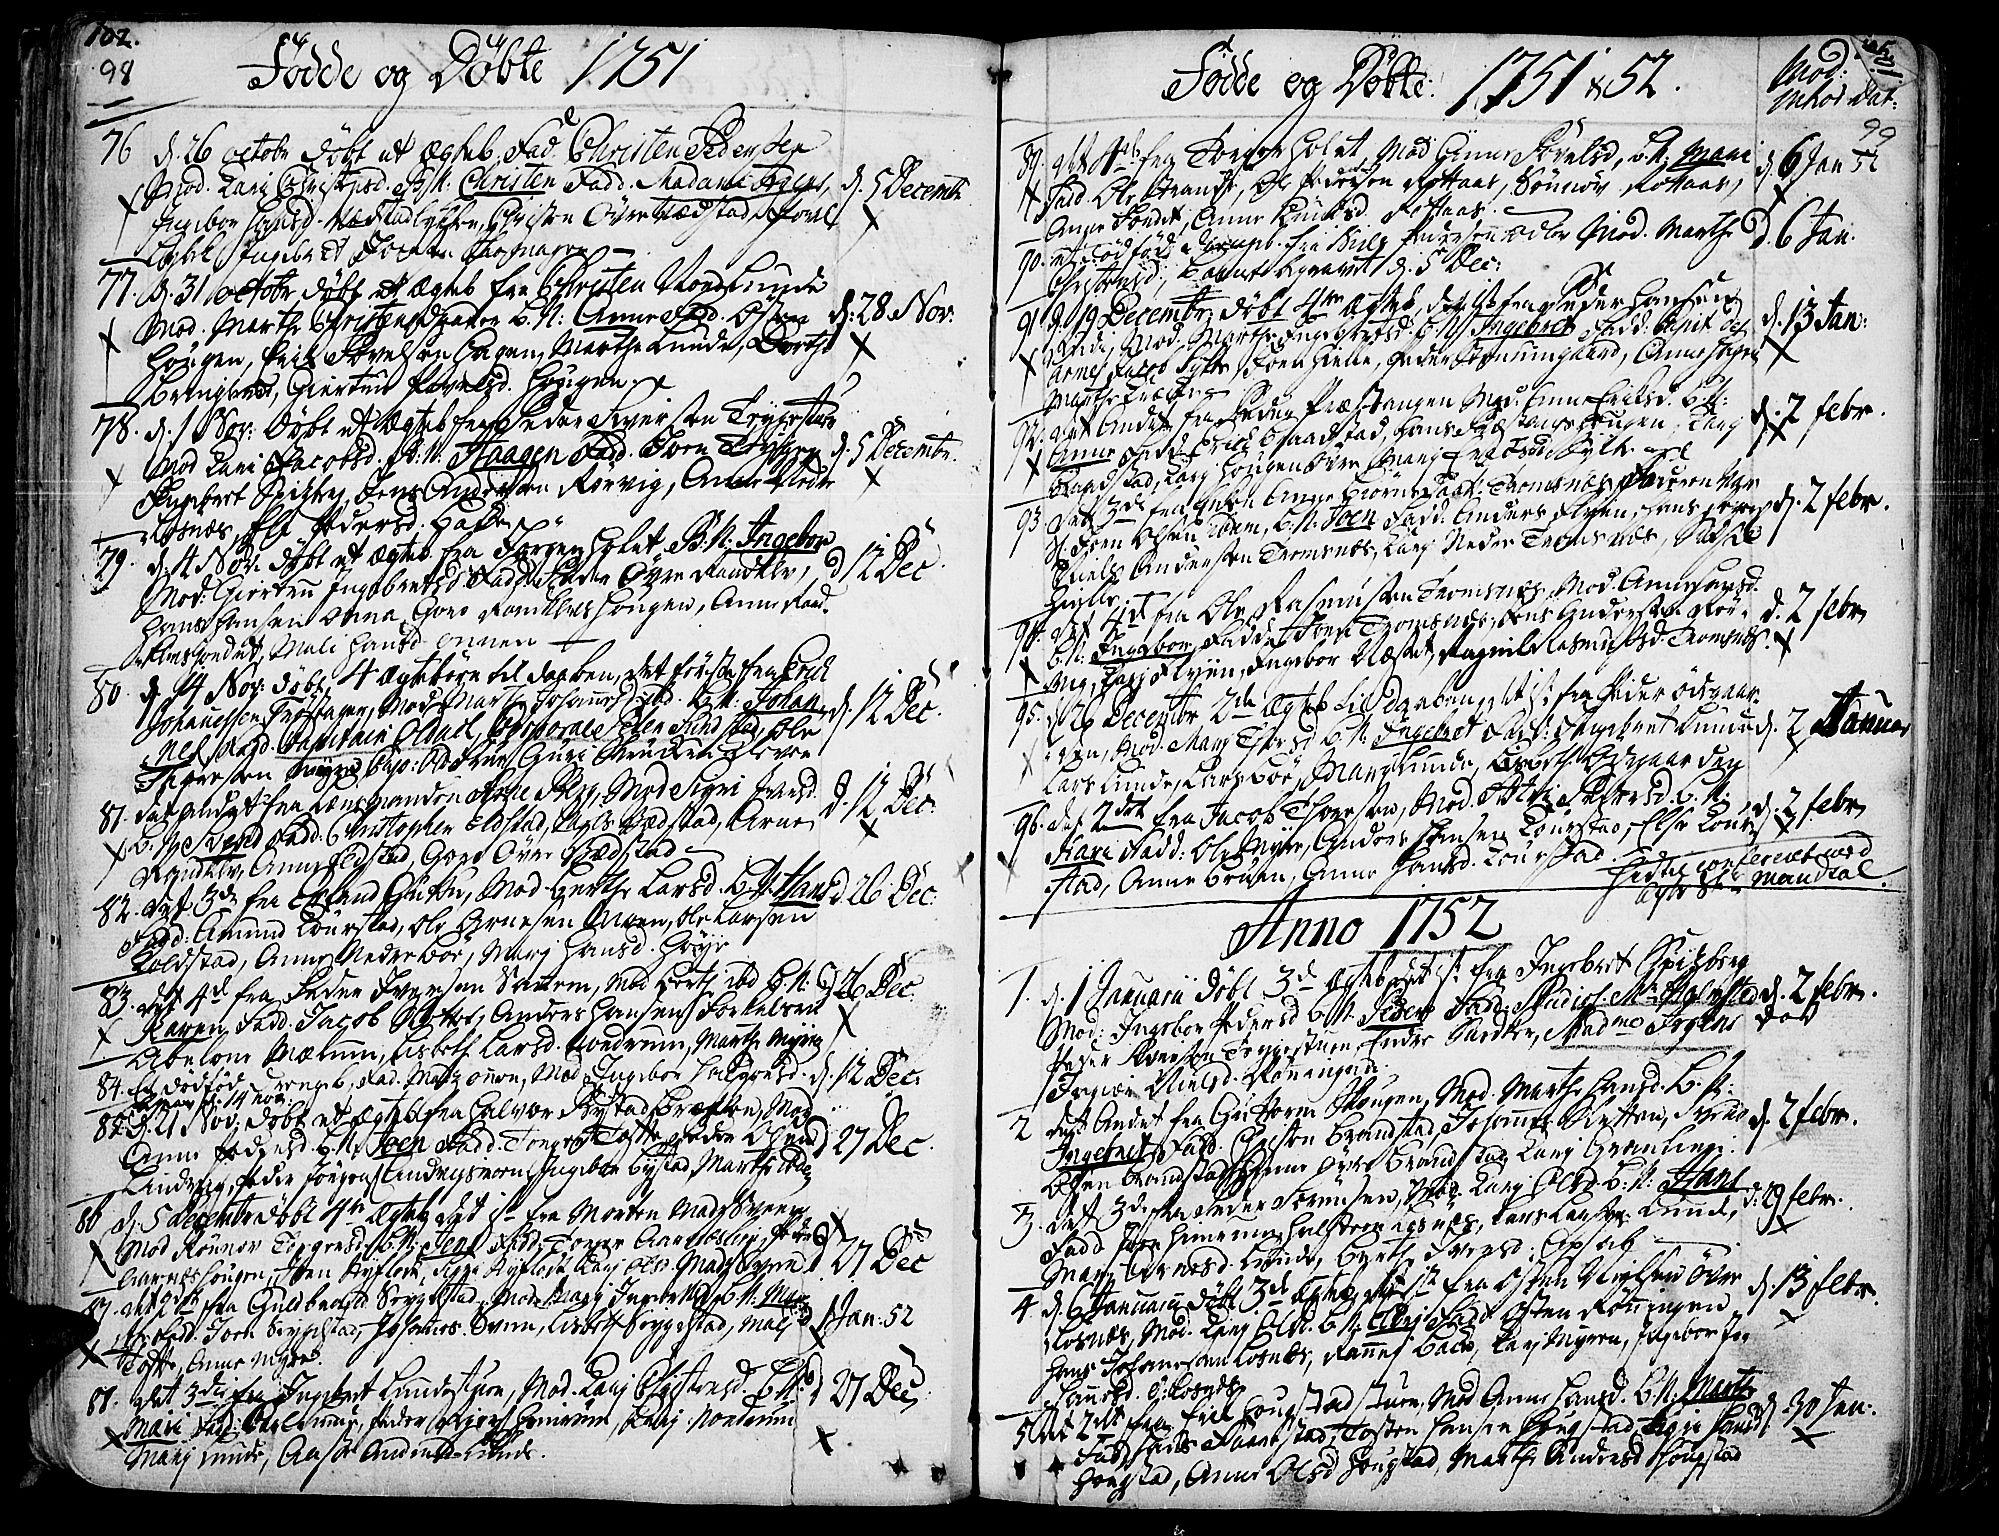 SAH, Ringebu prestekontor, Ministerialbok nr. 2, 1734-1780, s. 98-99